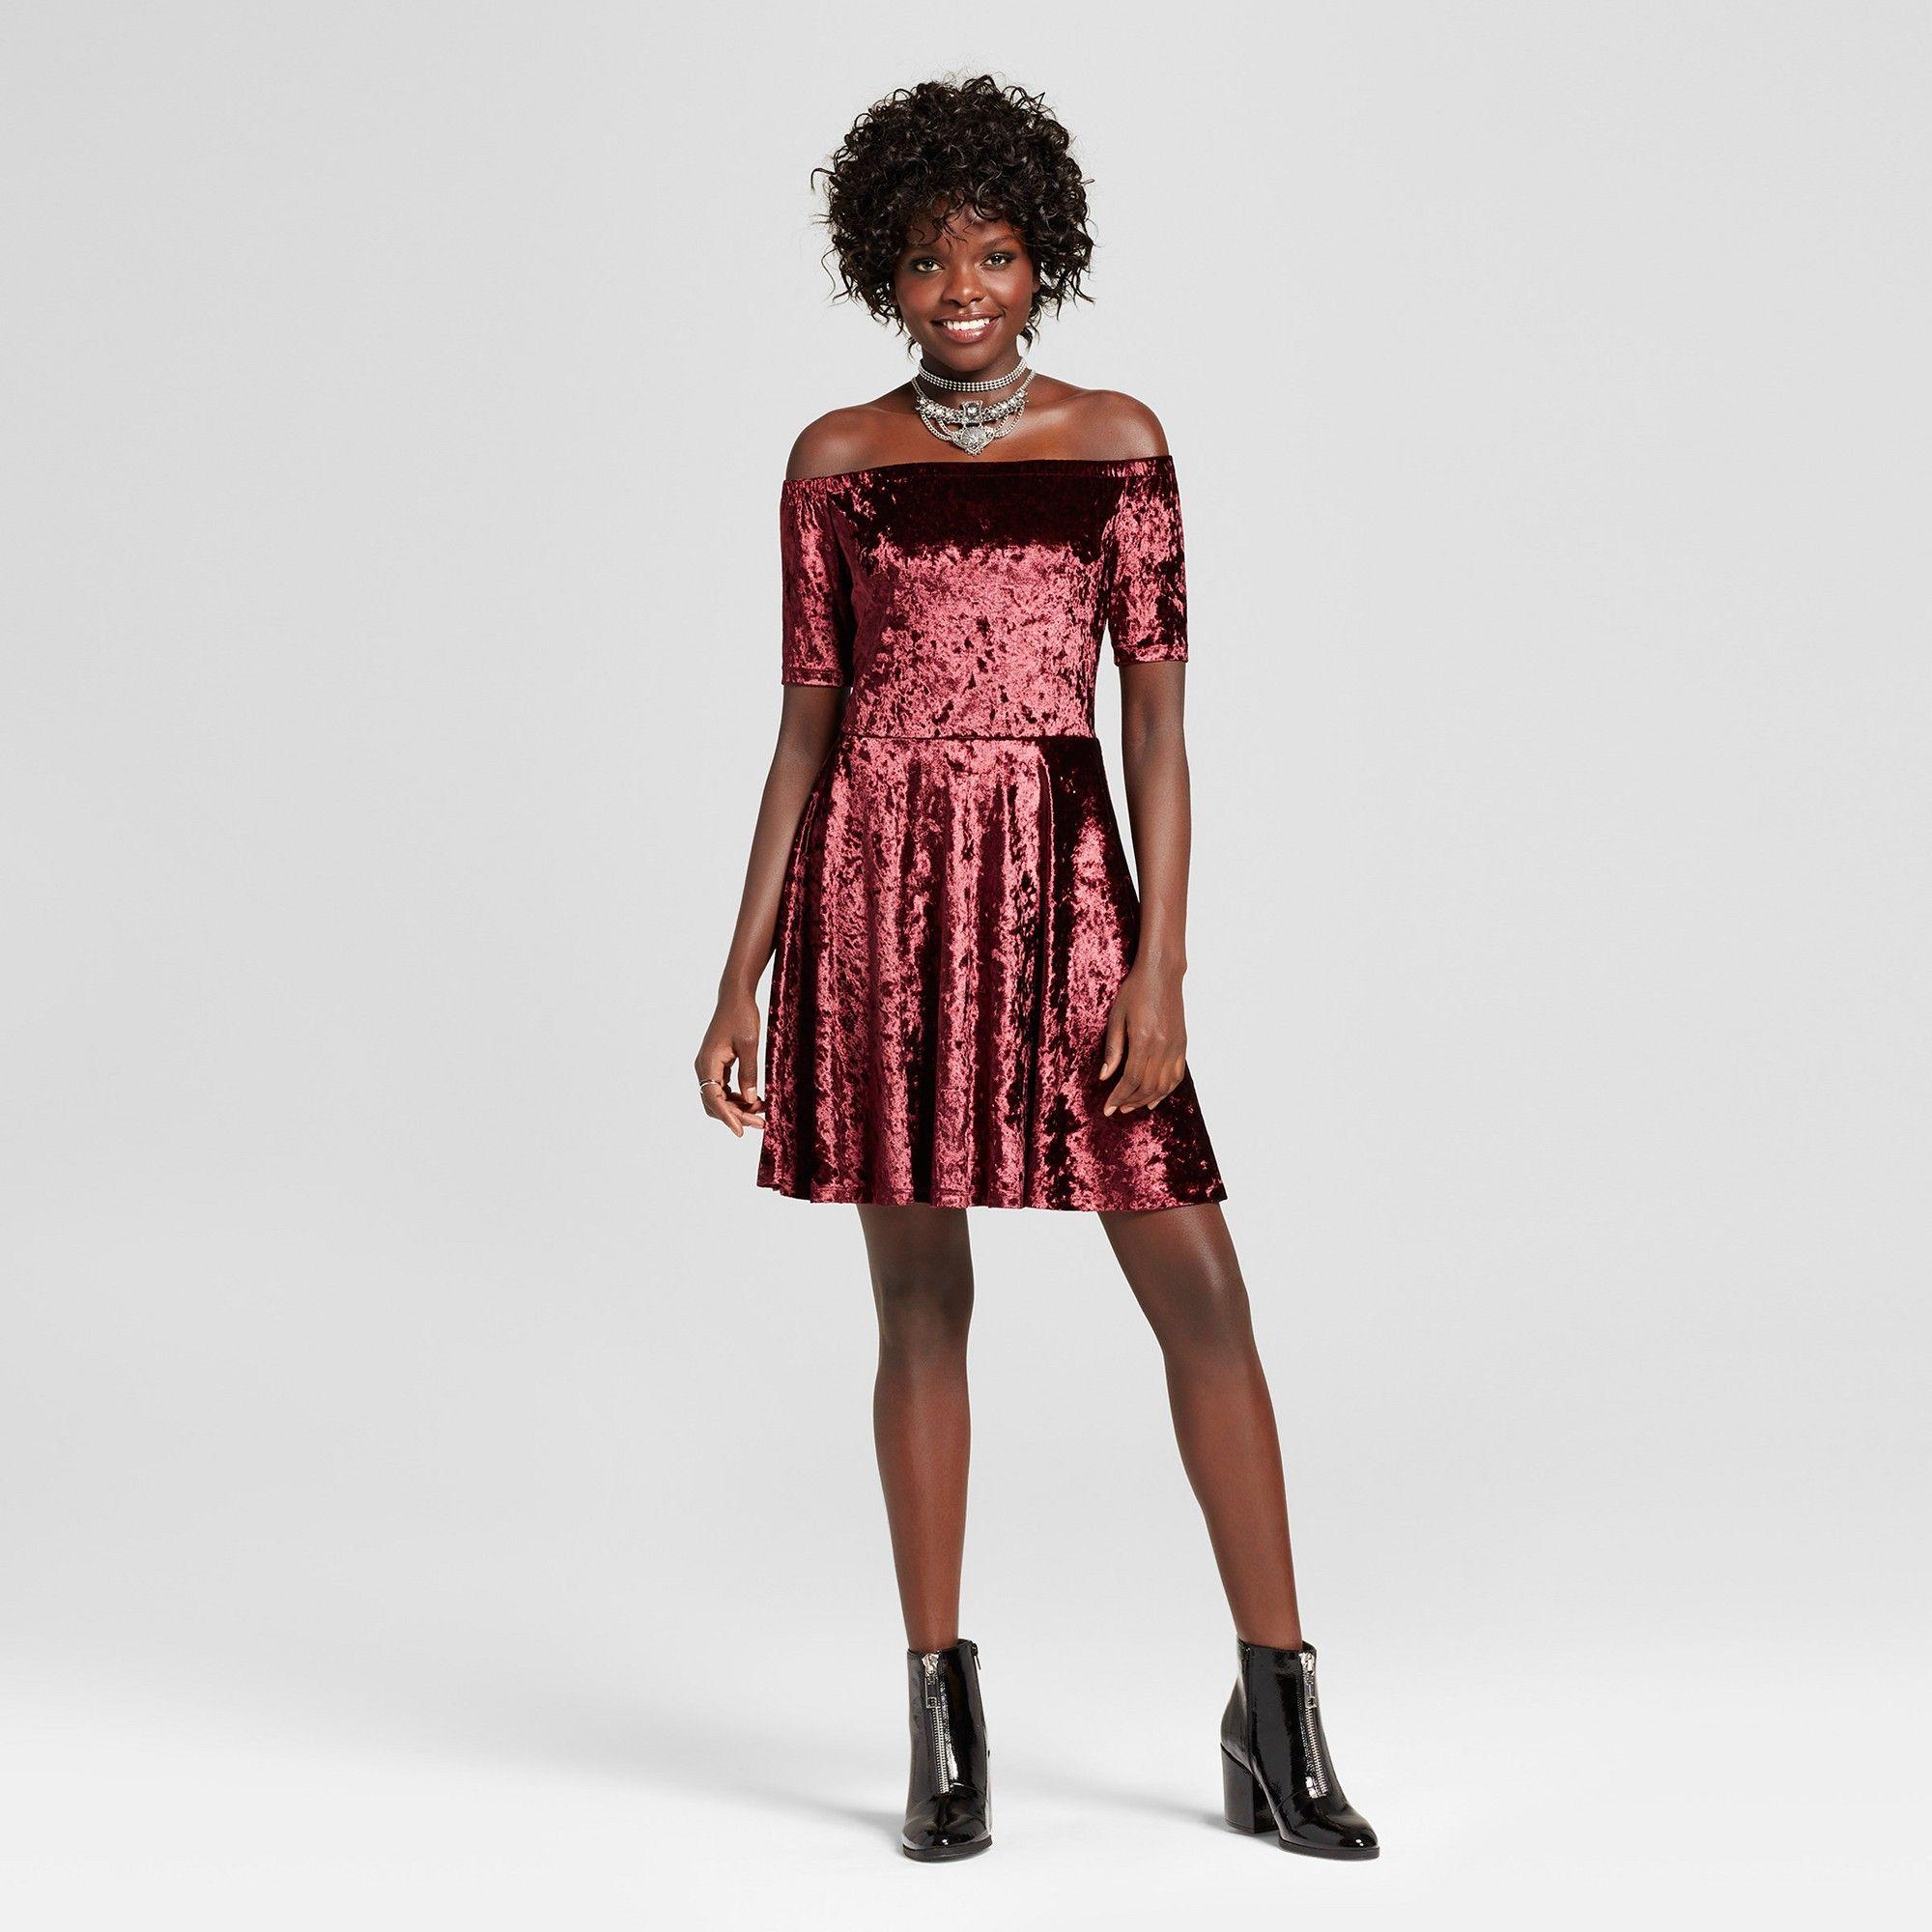 109289b57cc8 Women's Crushed Velvet Off the Shoulder Dress - Xhilaration (Juniors')  Berry S, Red